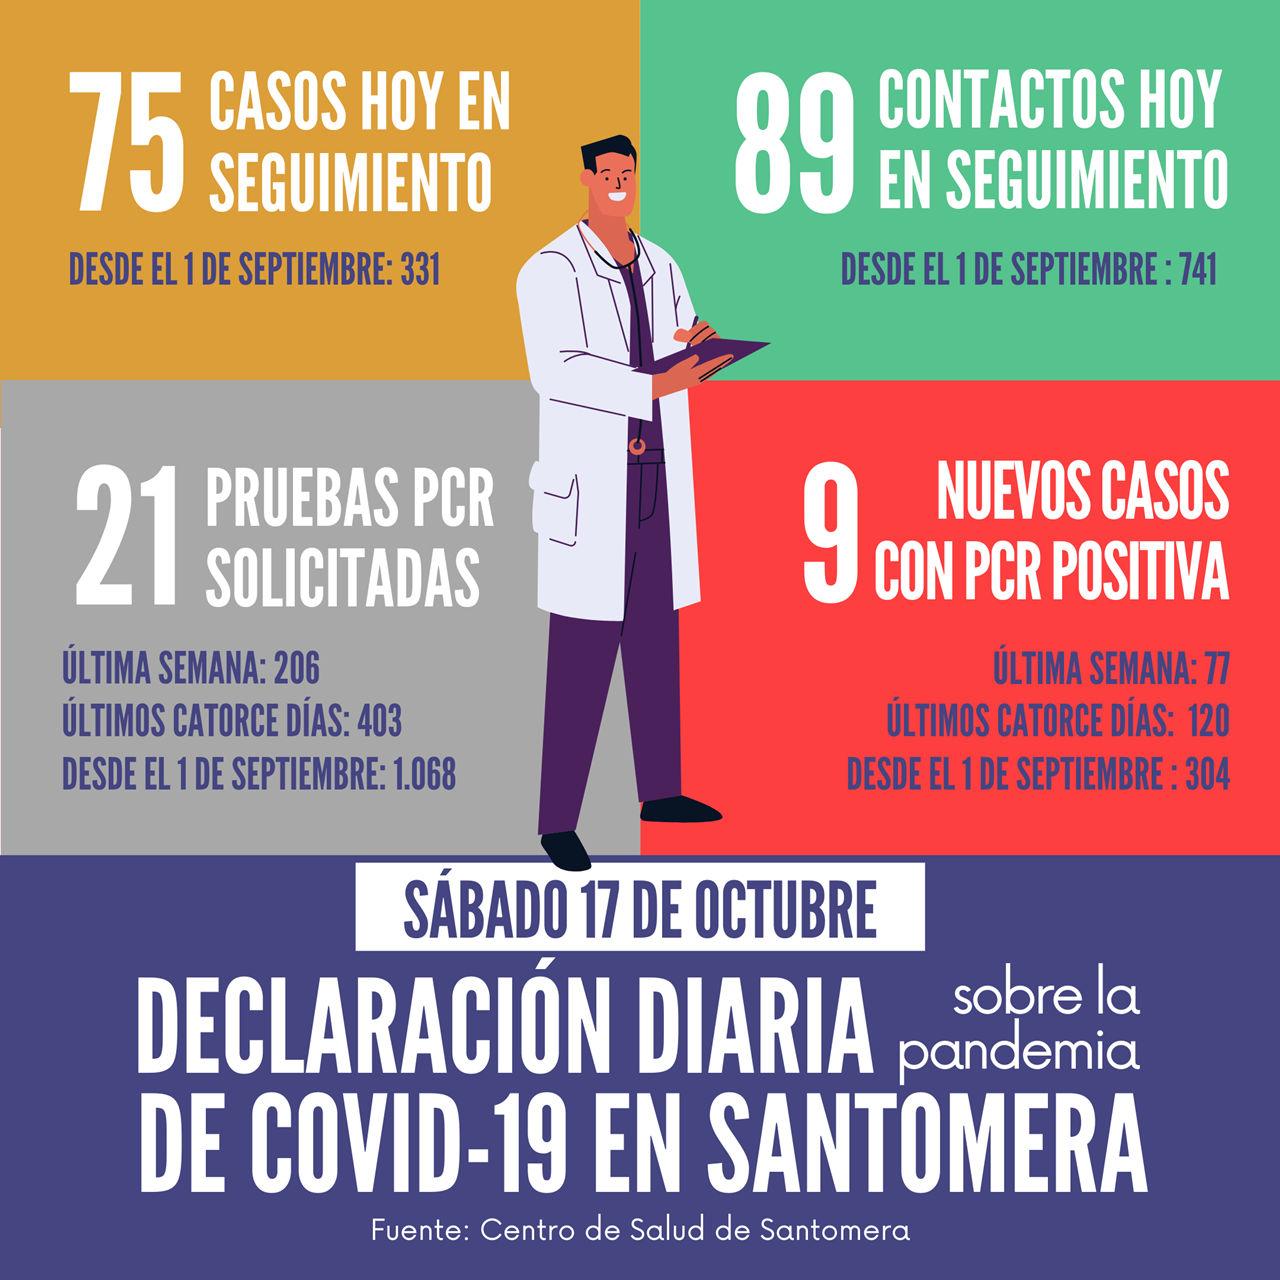 20201017_Datos COVID-19 Santomera